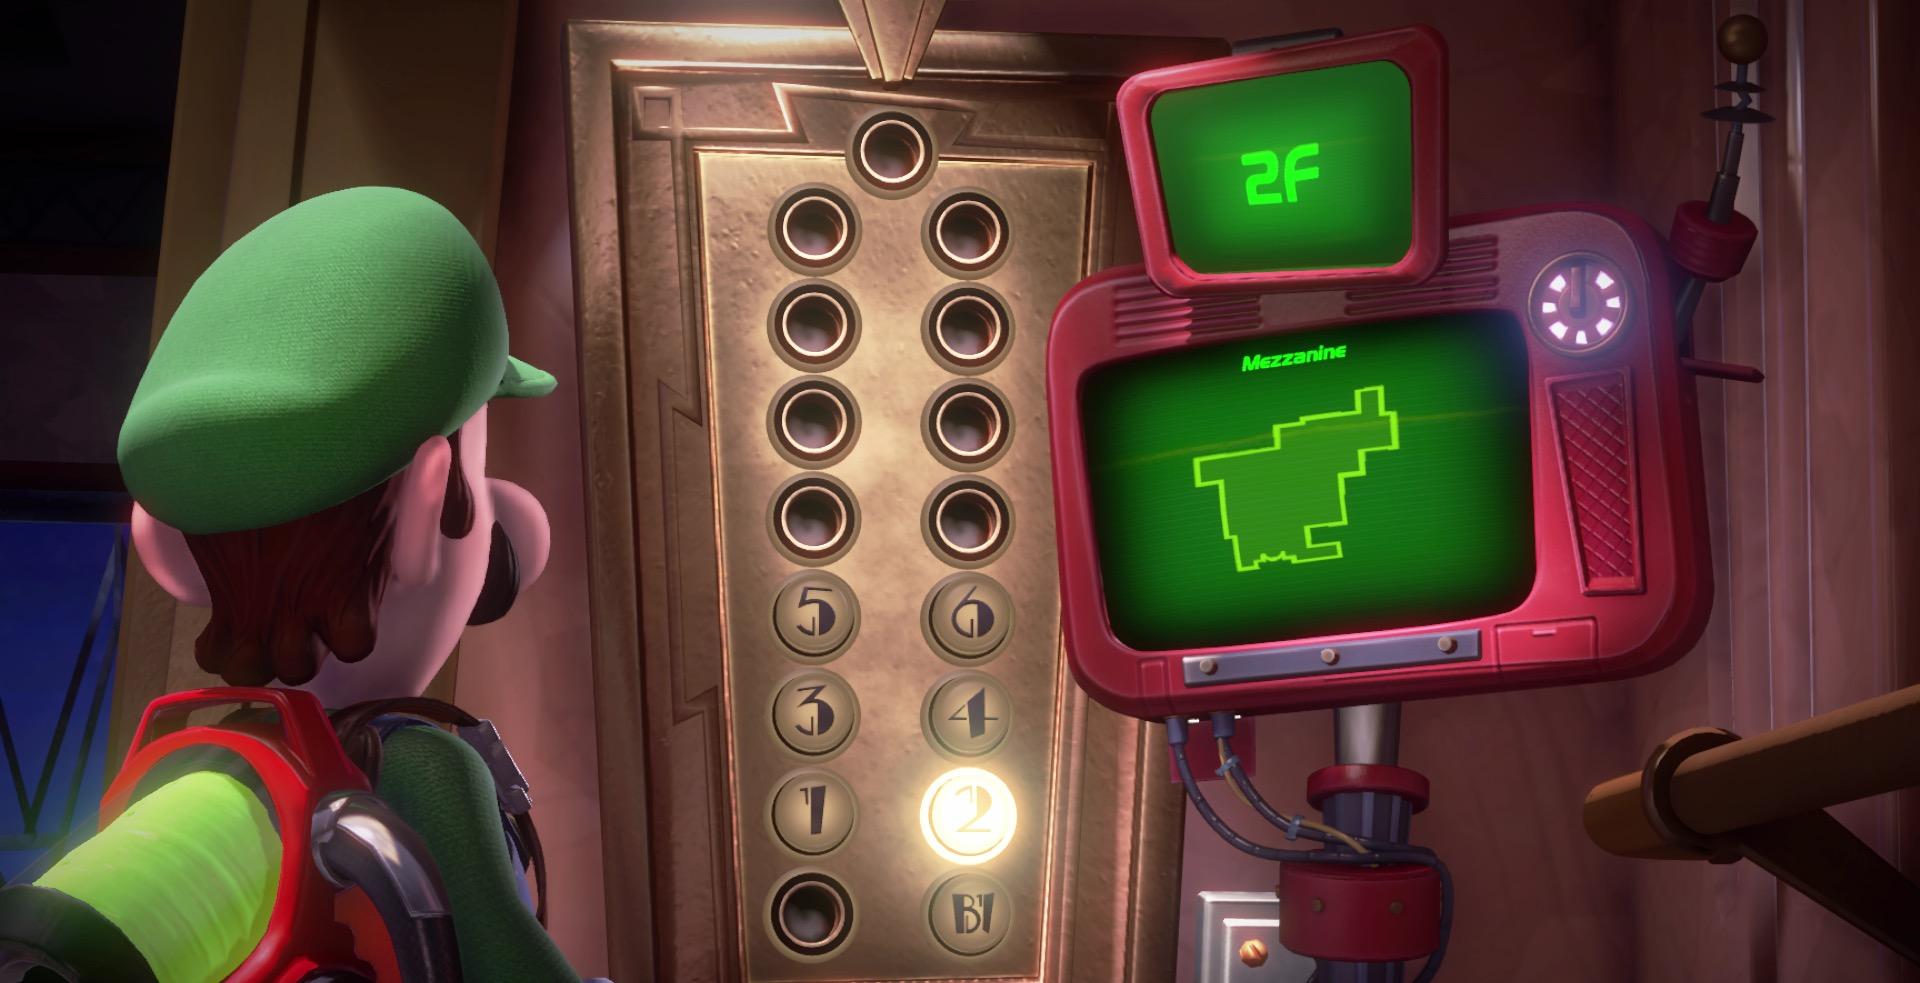 Luigi's Mansion 3 guide 2F gem locations guide